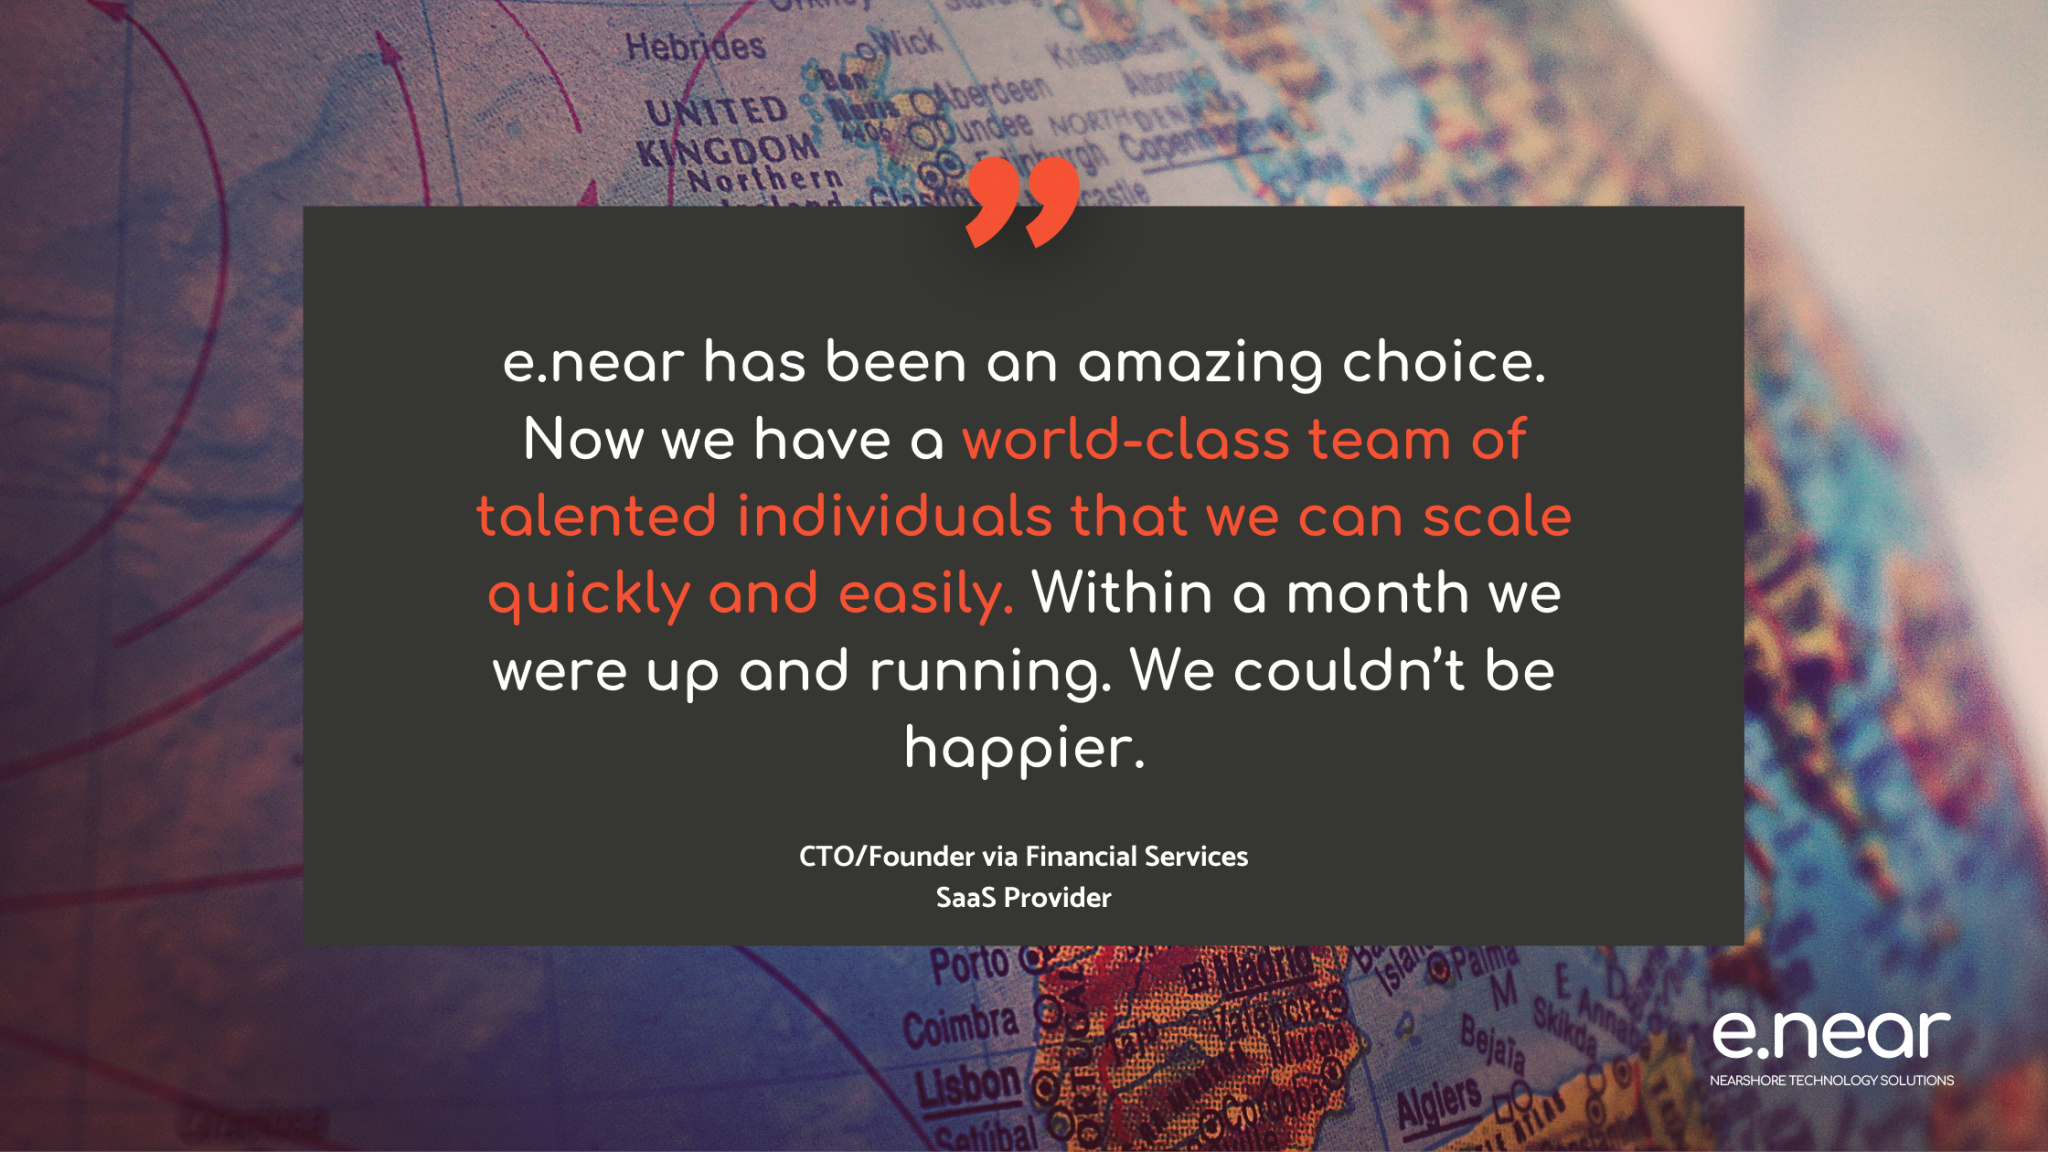 testimonial of an e.near client